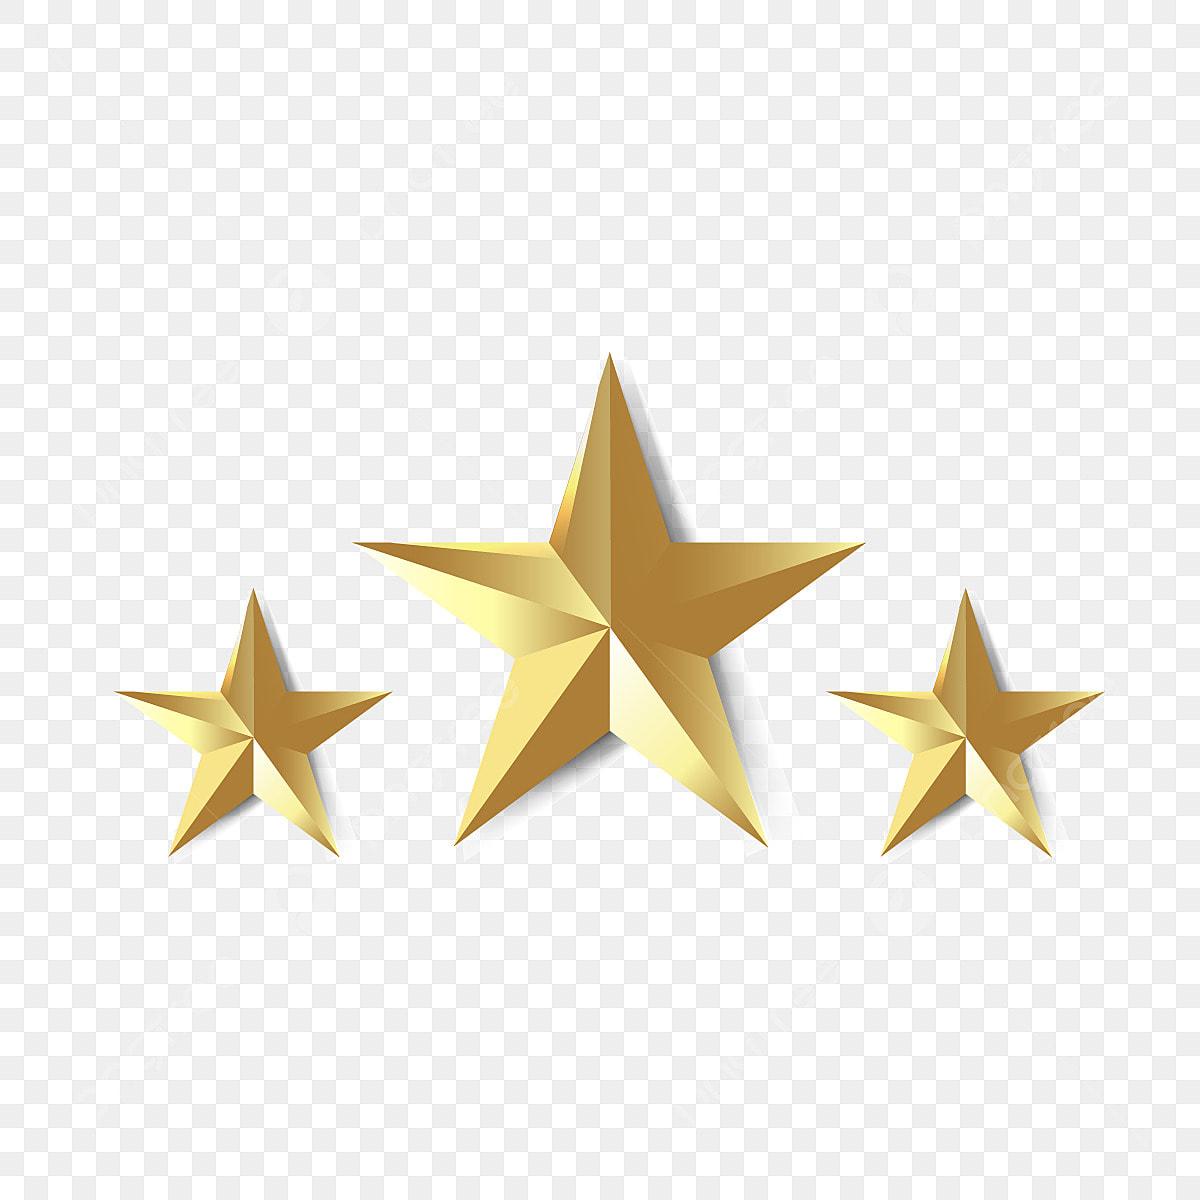 Gambar Bintang Simbol Emas Mengkilap, Keemasan, Bintang, Bintang PNG dan  Vektor dengan Latar Belakang Transparan untuk Unduh Gratis